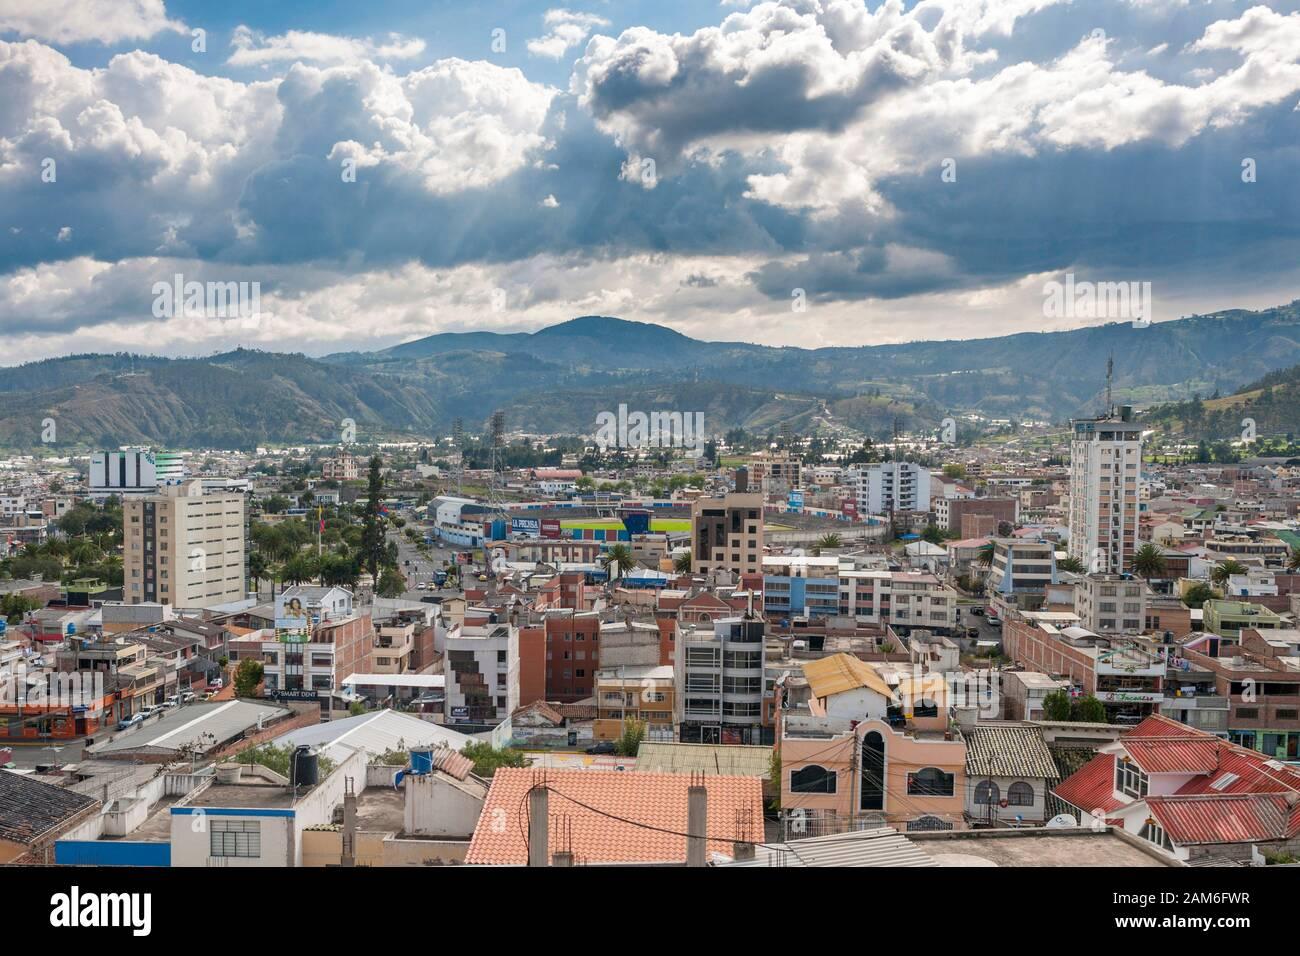 The Town Of Riobamba In Ecuador Stock Photo Alamy